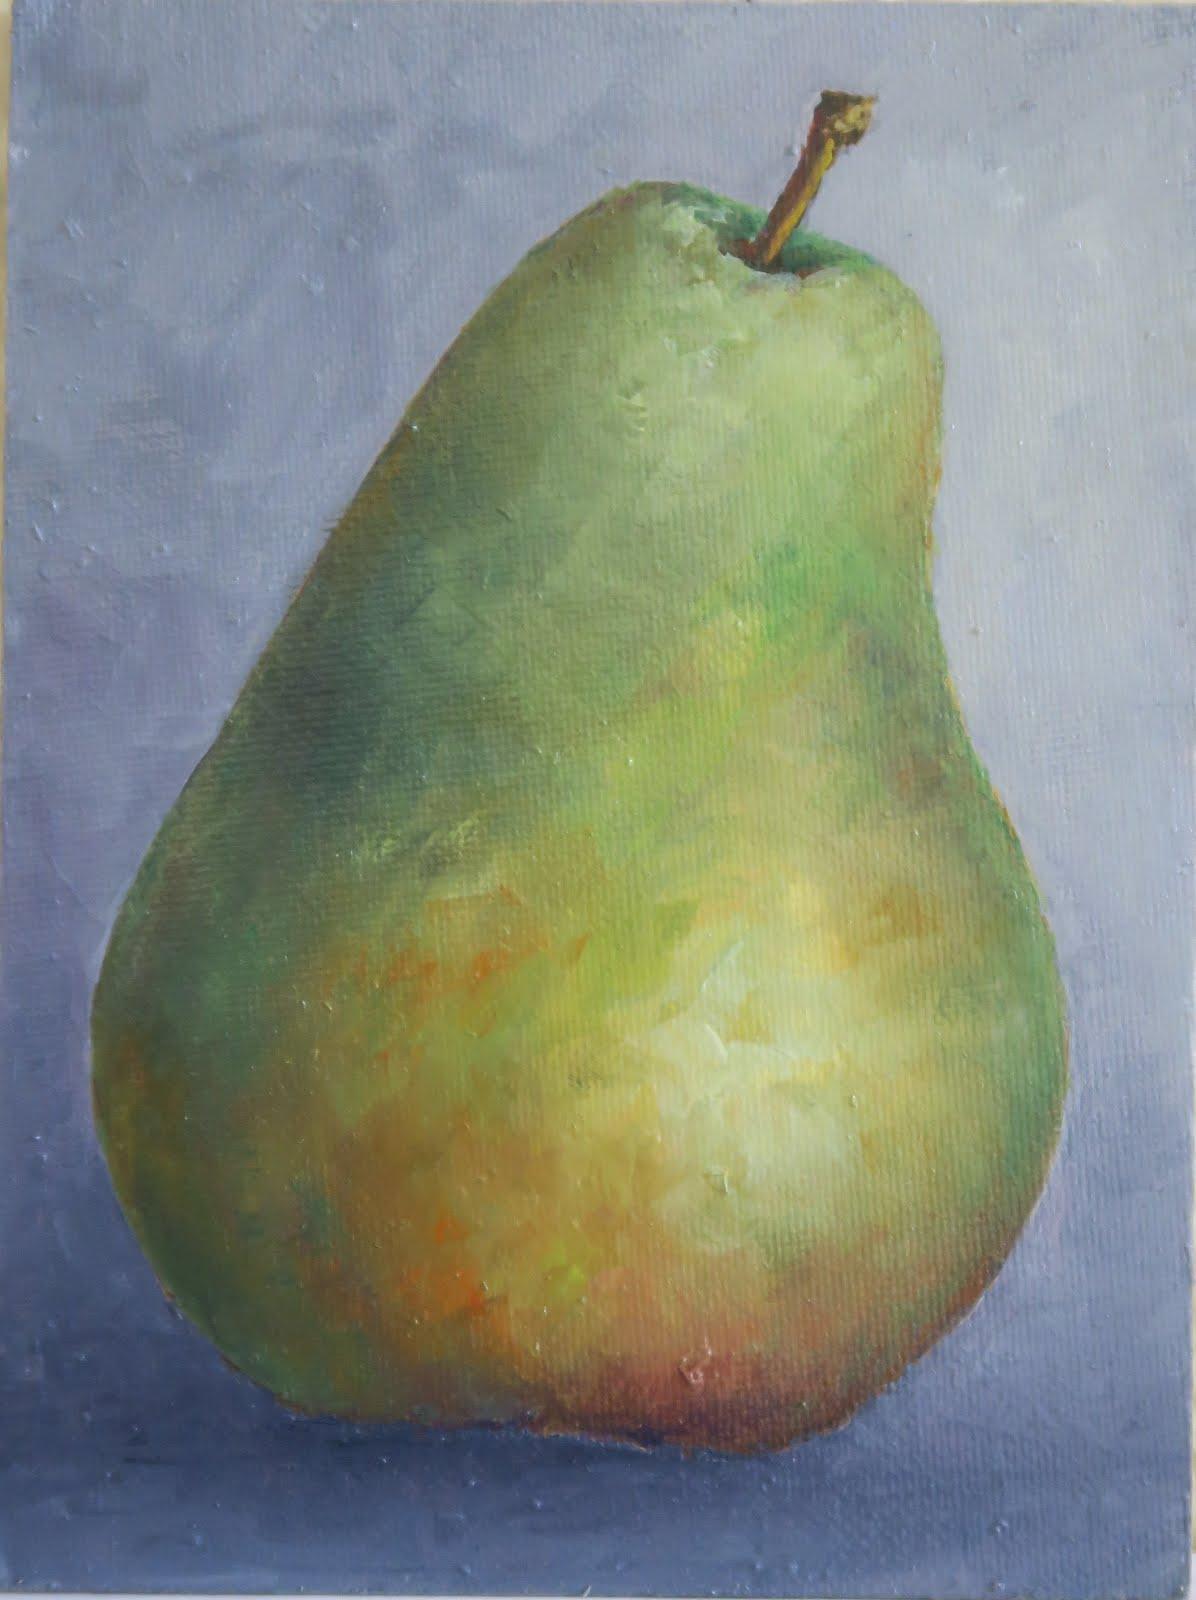 Una pera (16x12 cm)